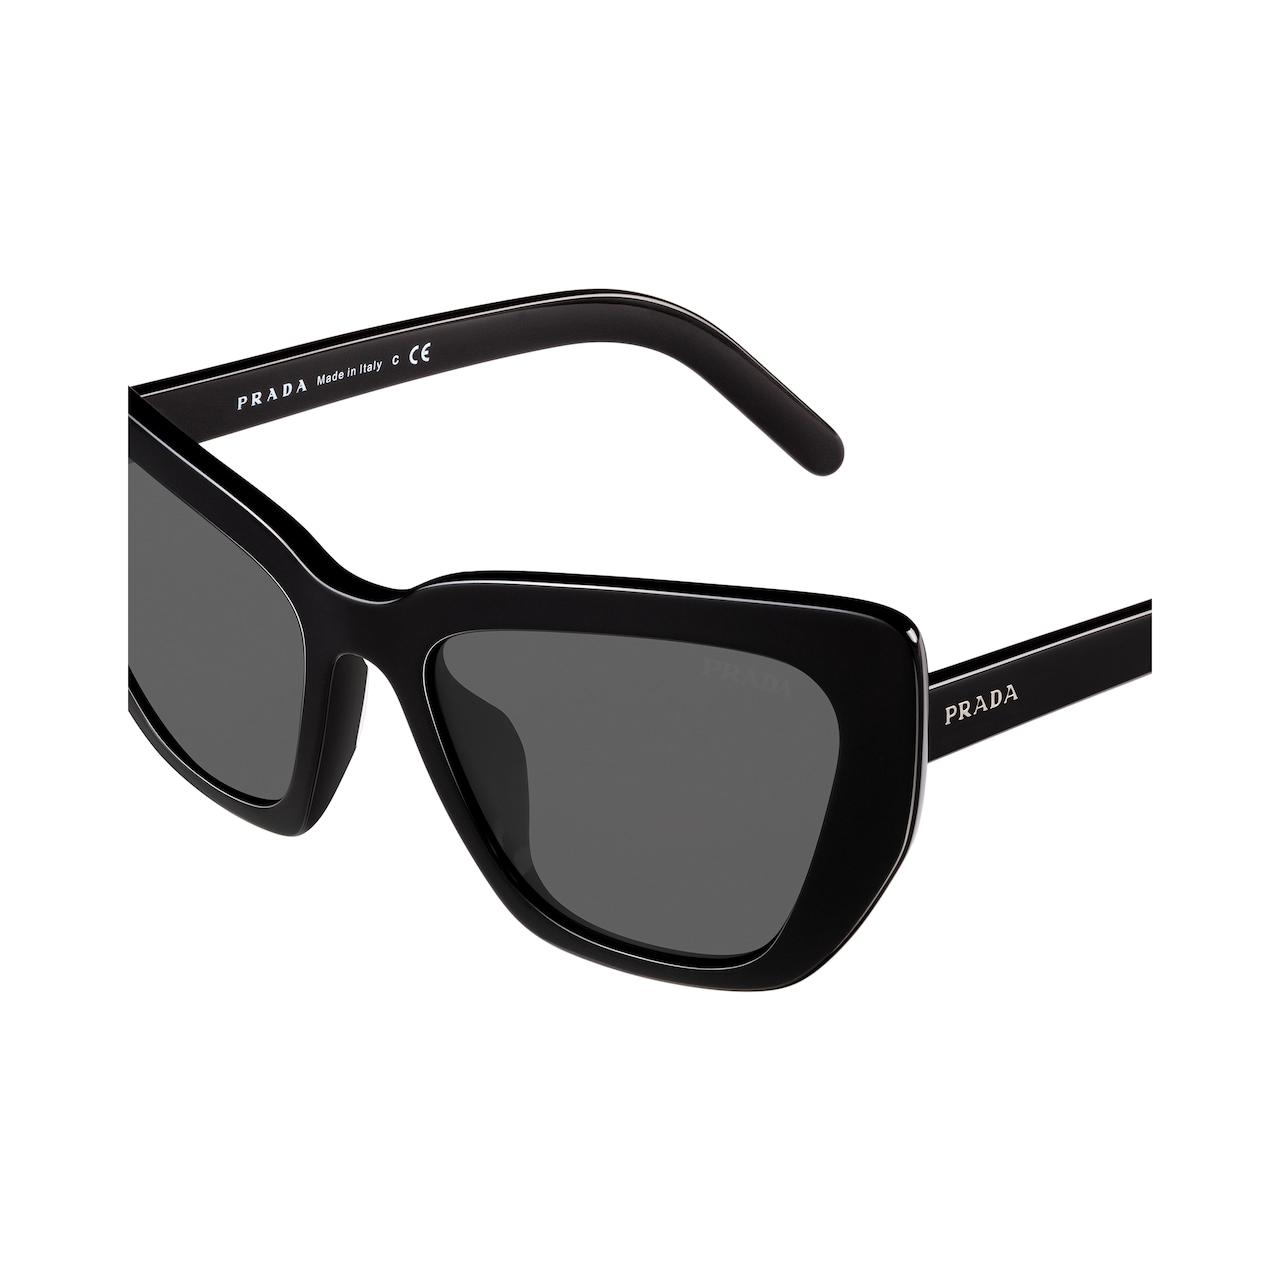 Prada Postcard sunglasses Alternative Fit